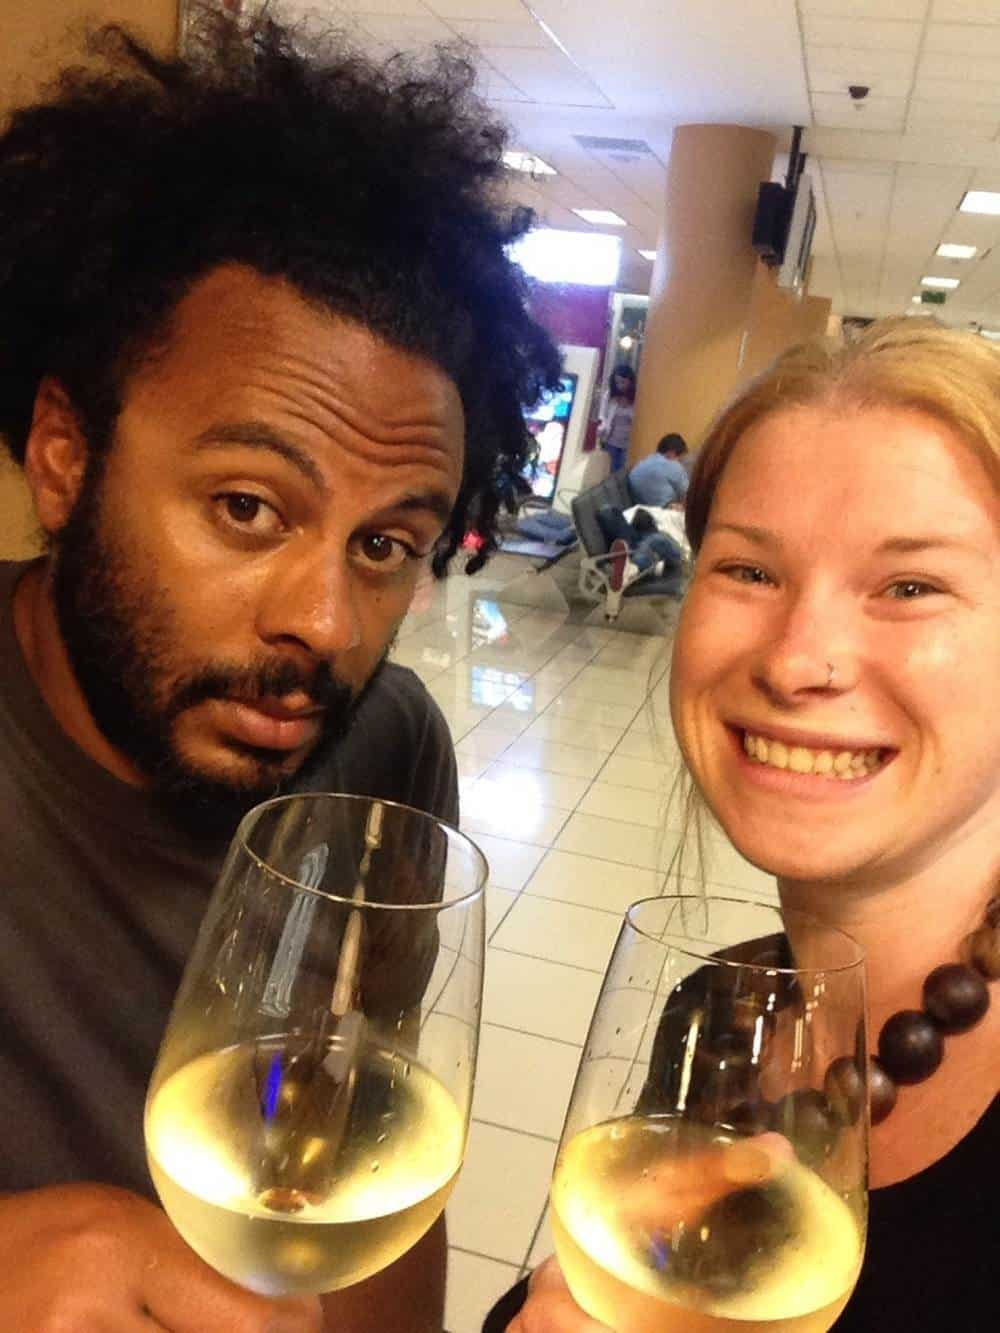 James and Sarah with Sauvignon Blanc for 9USD